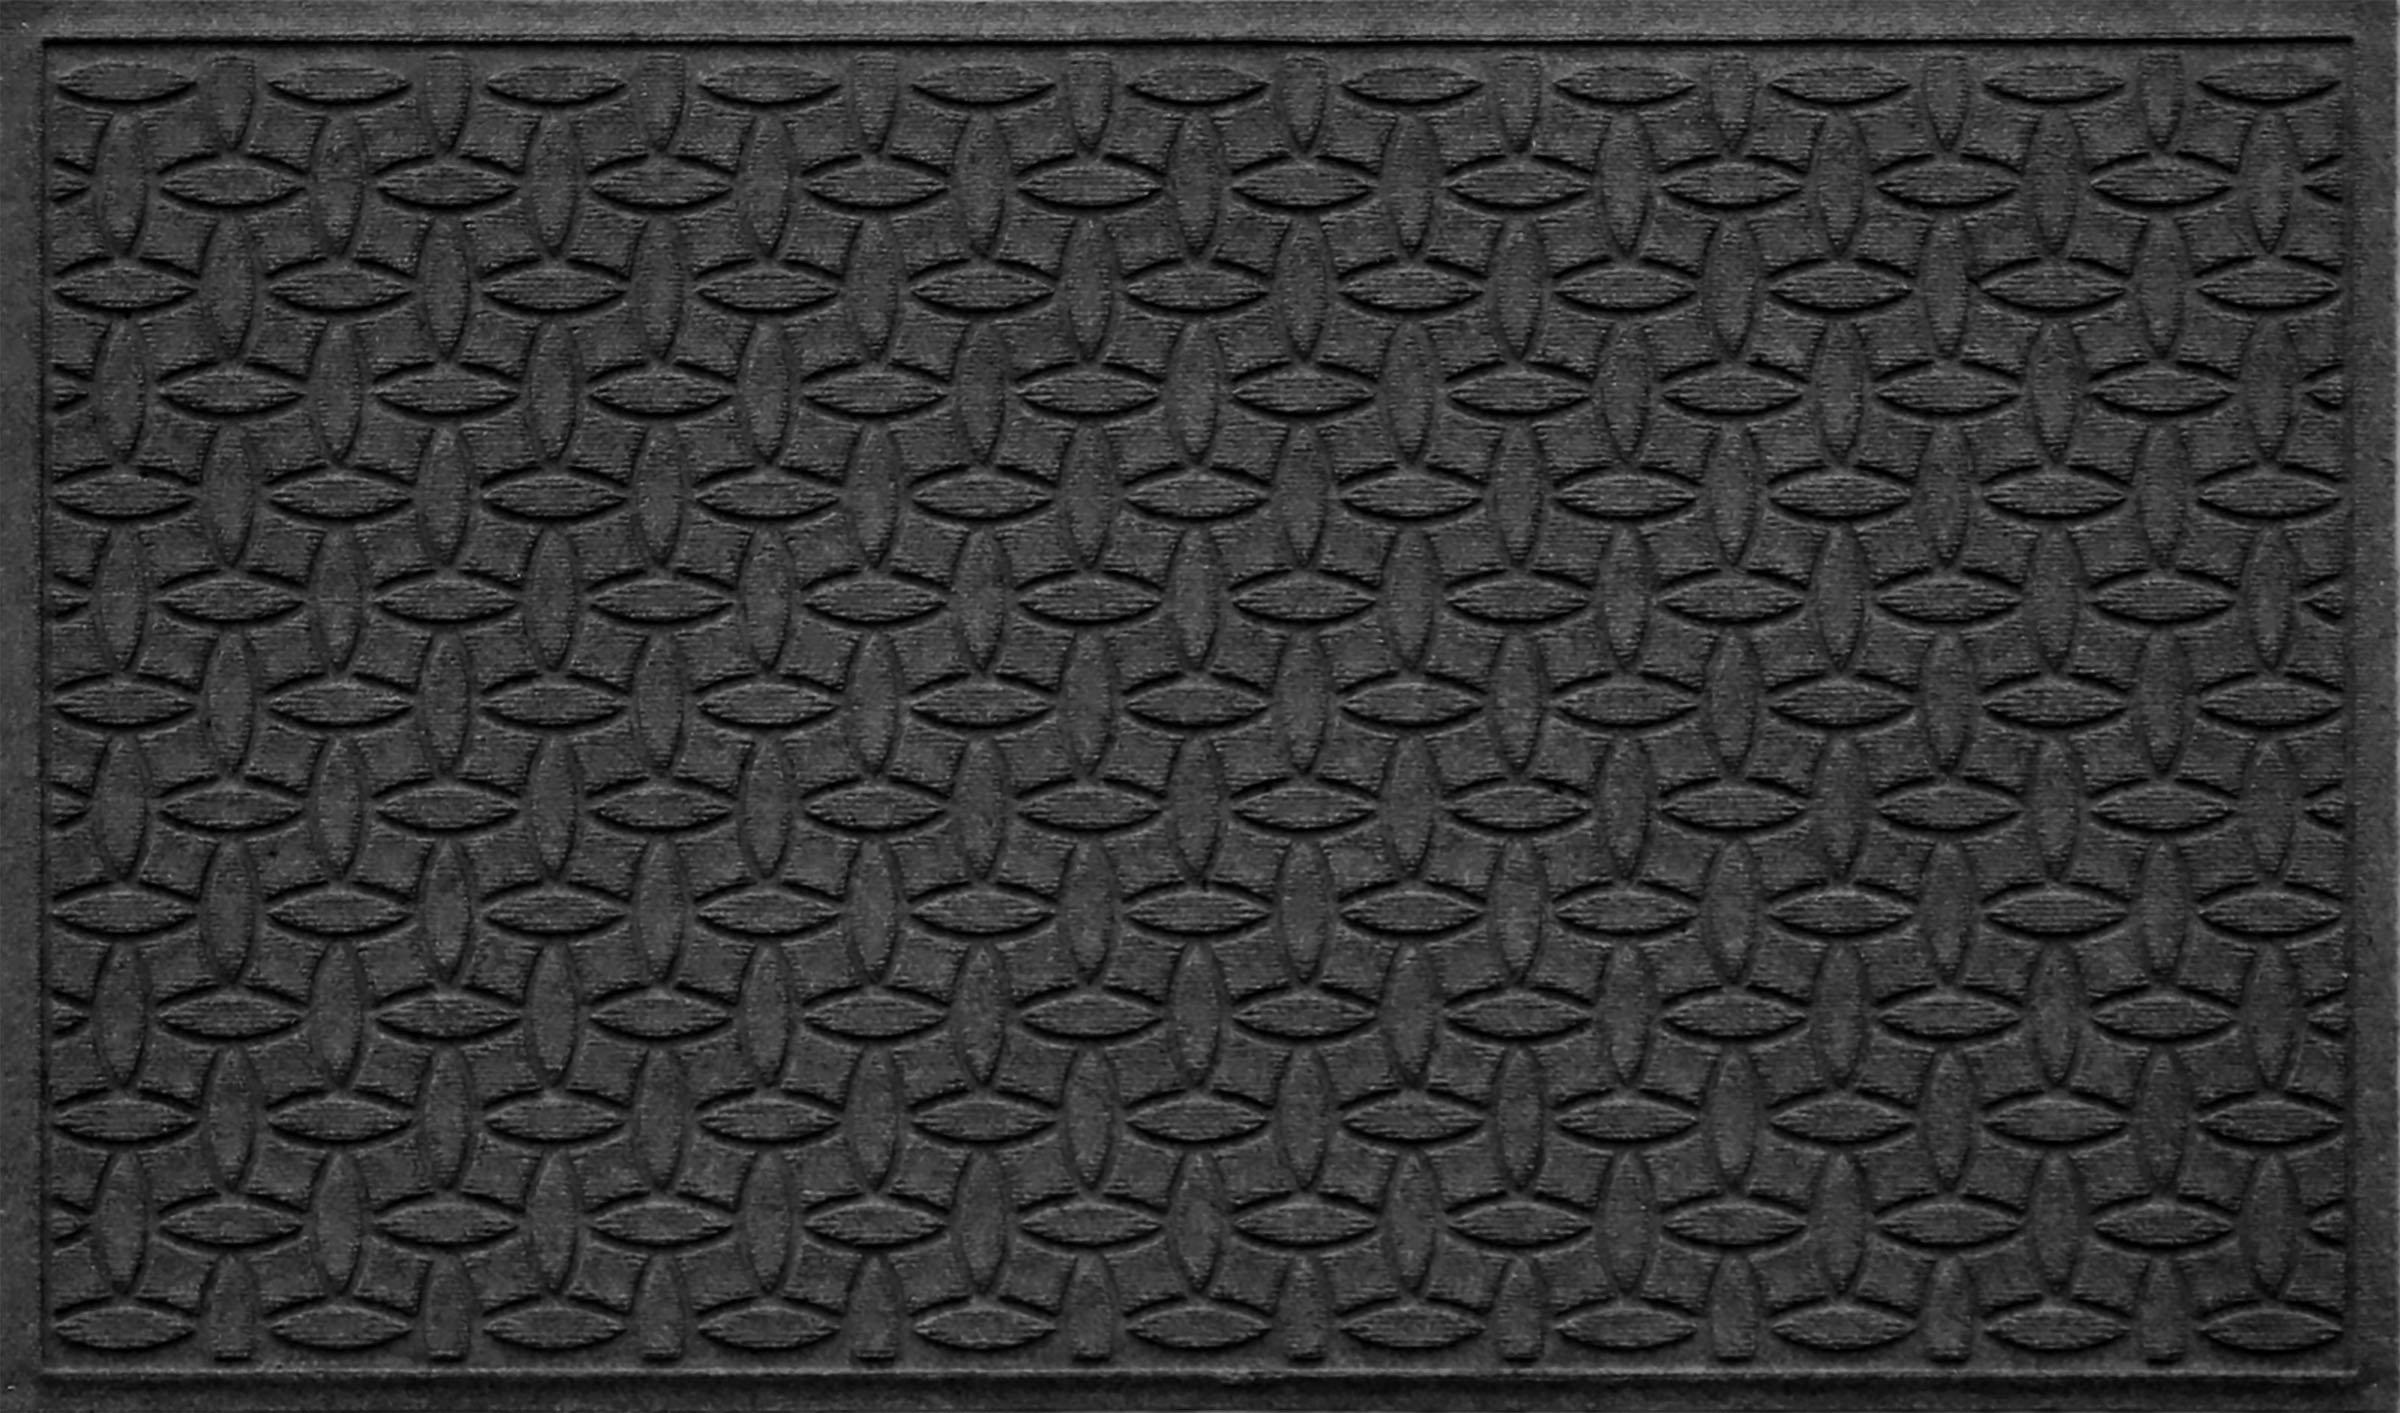 Bungalow Flooring Waterhog Doormat, 3' x 5', Skid Resistant, Easy to Clean, Catches Water and Debris, Ellipse Collection, Charcoal